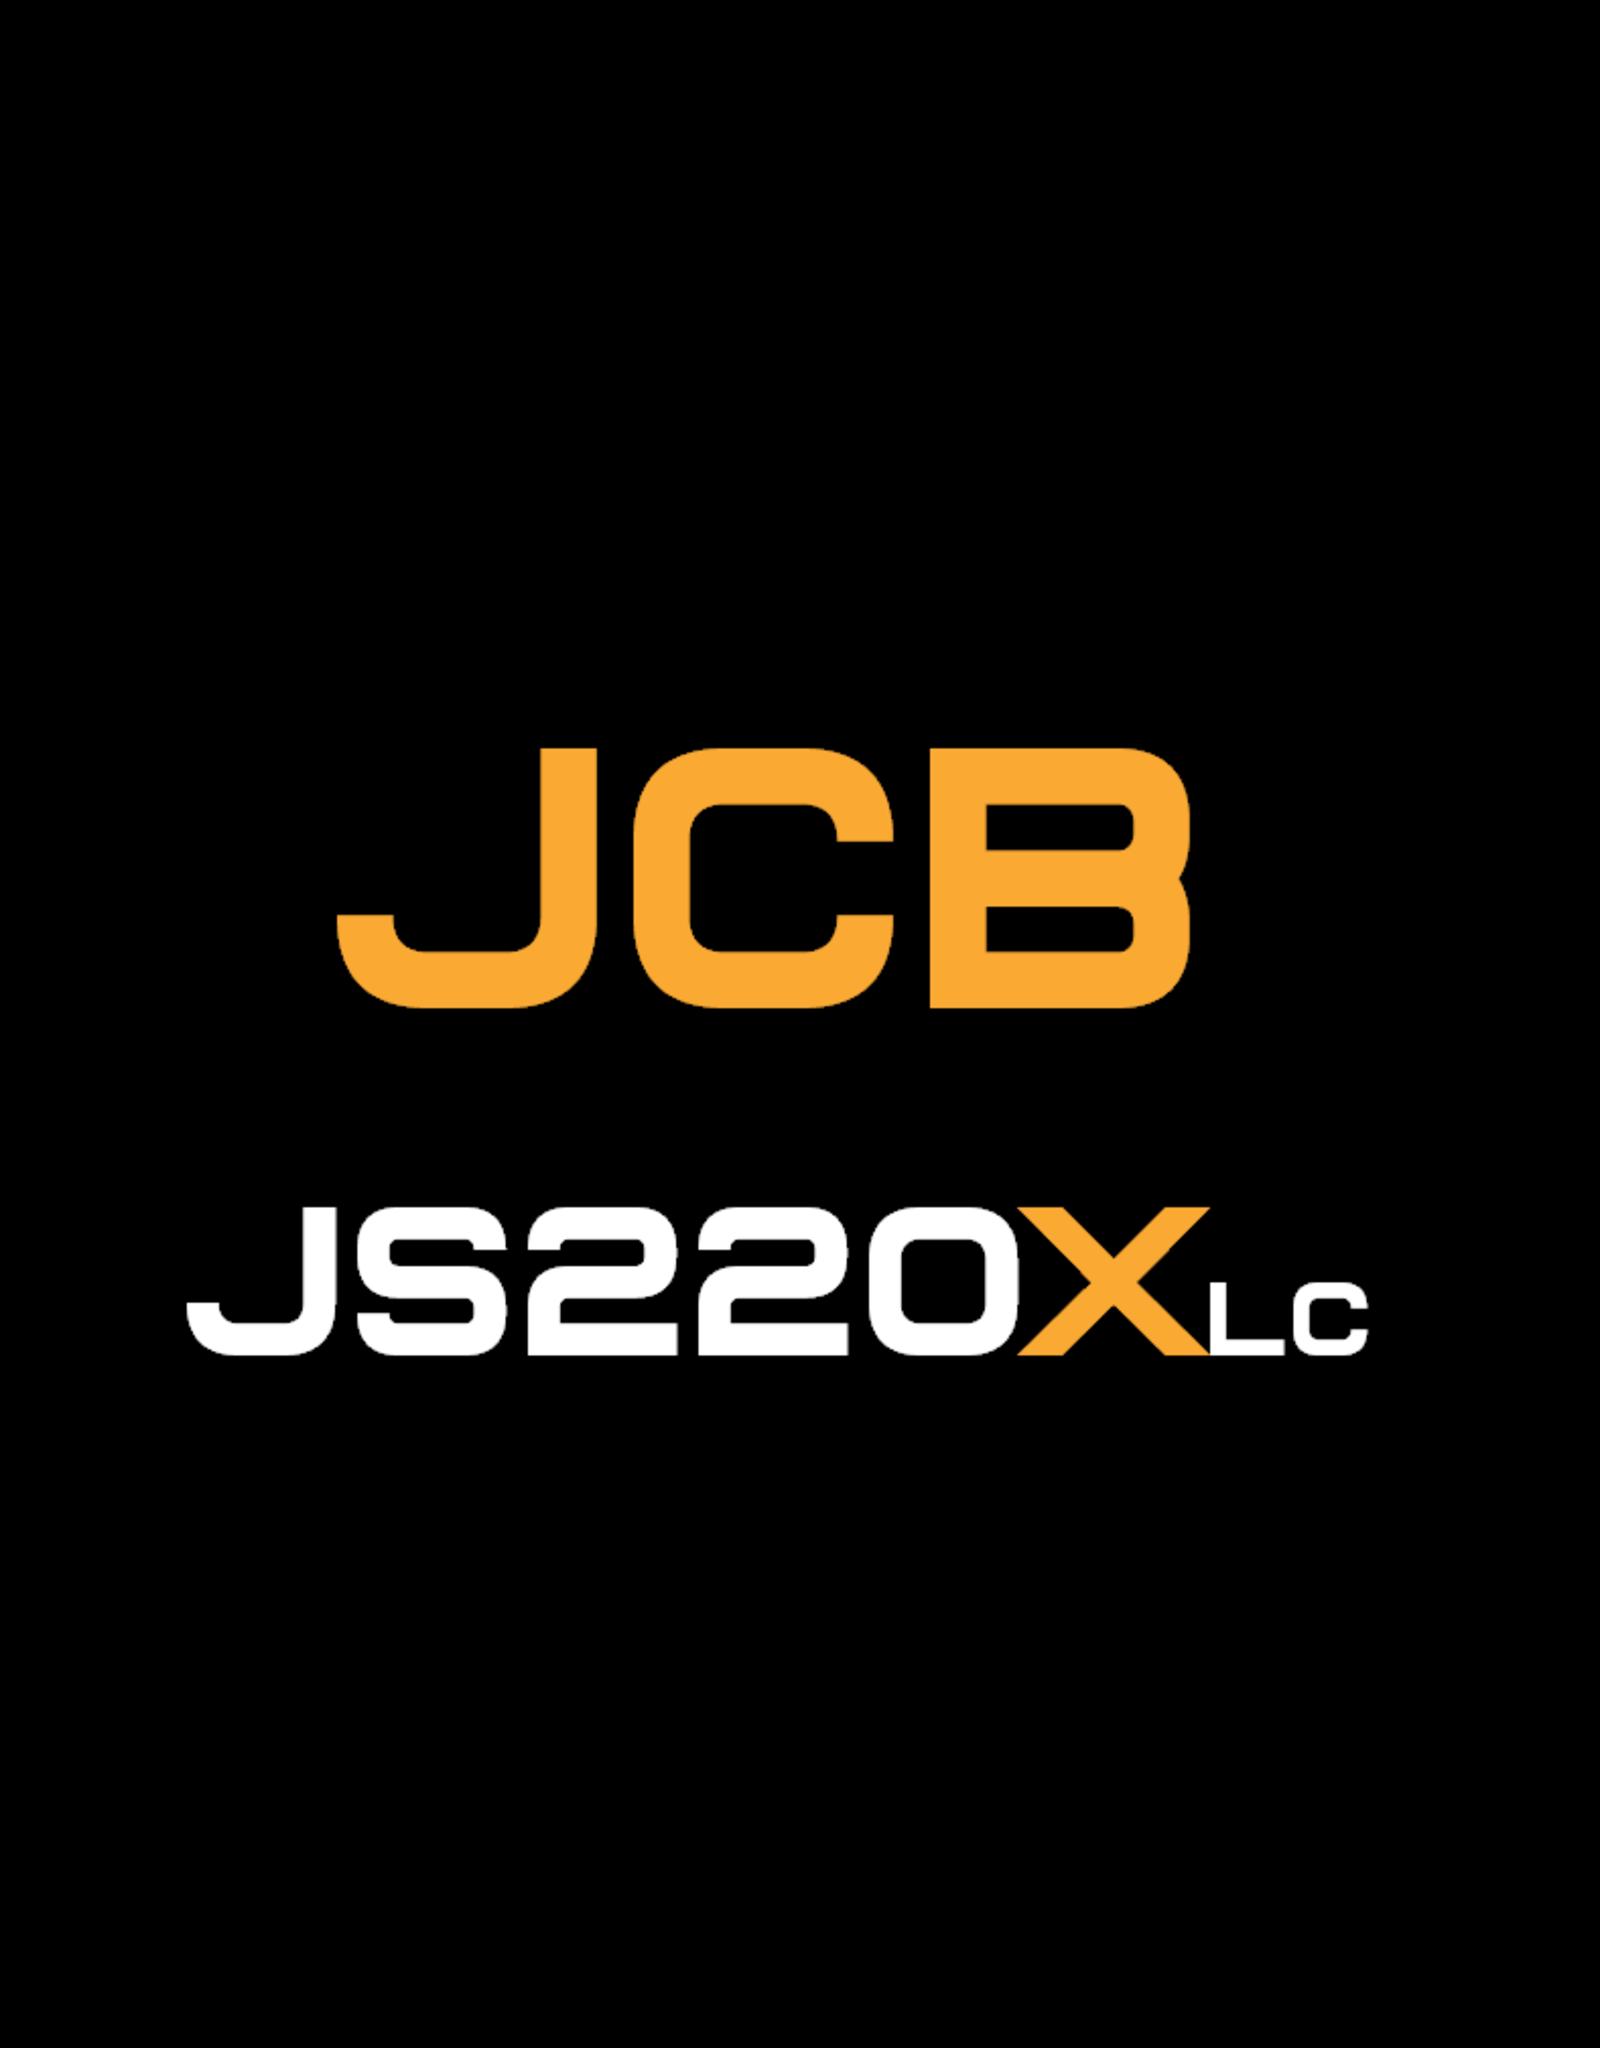 Echle Hartstahl GmbH FOPS for JCB JS220 X LC